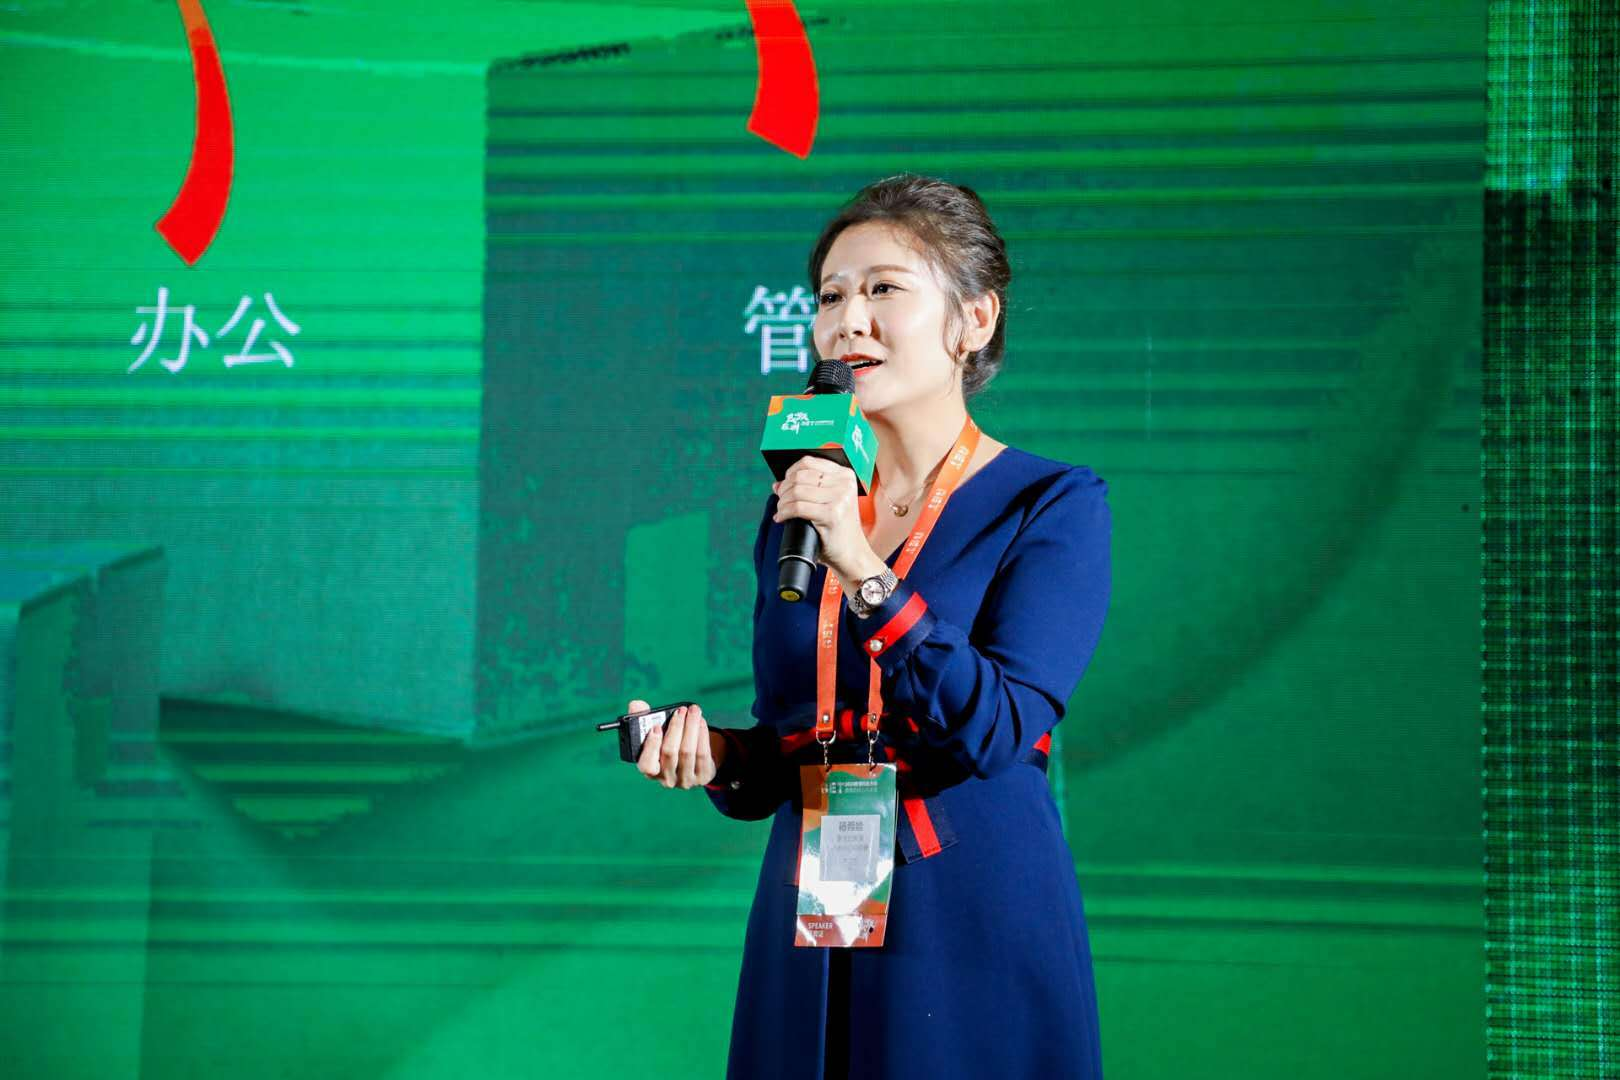 【GET2020】新文达杨希娃:OMO本质是一种方式,提供优质产品和服务才是目的